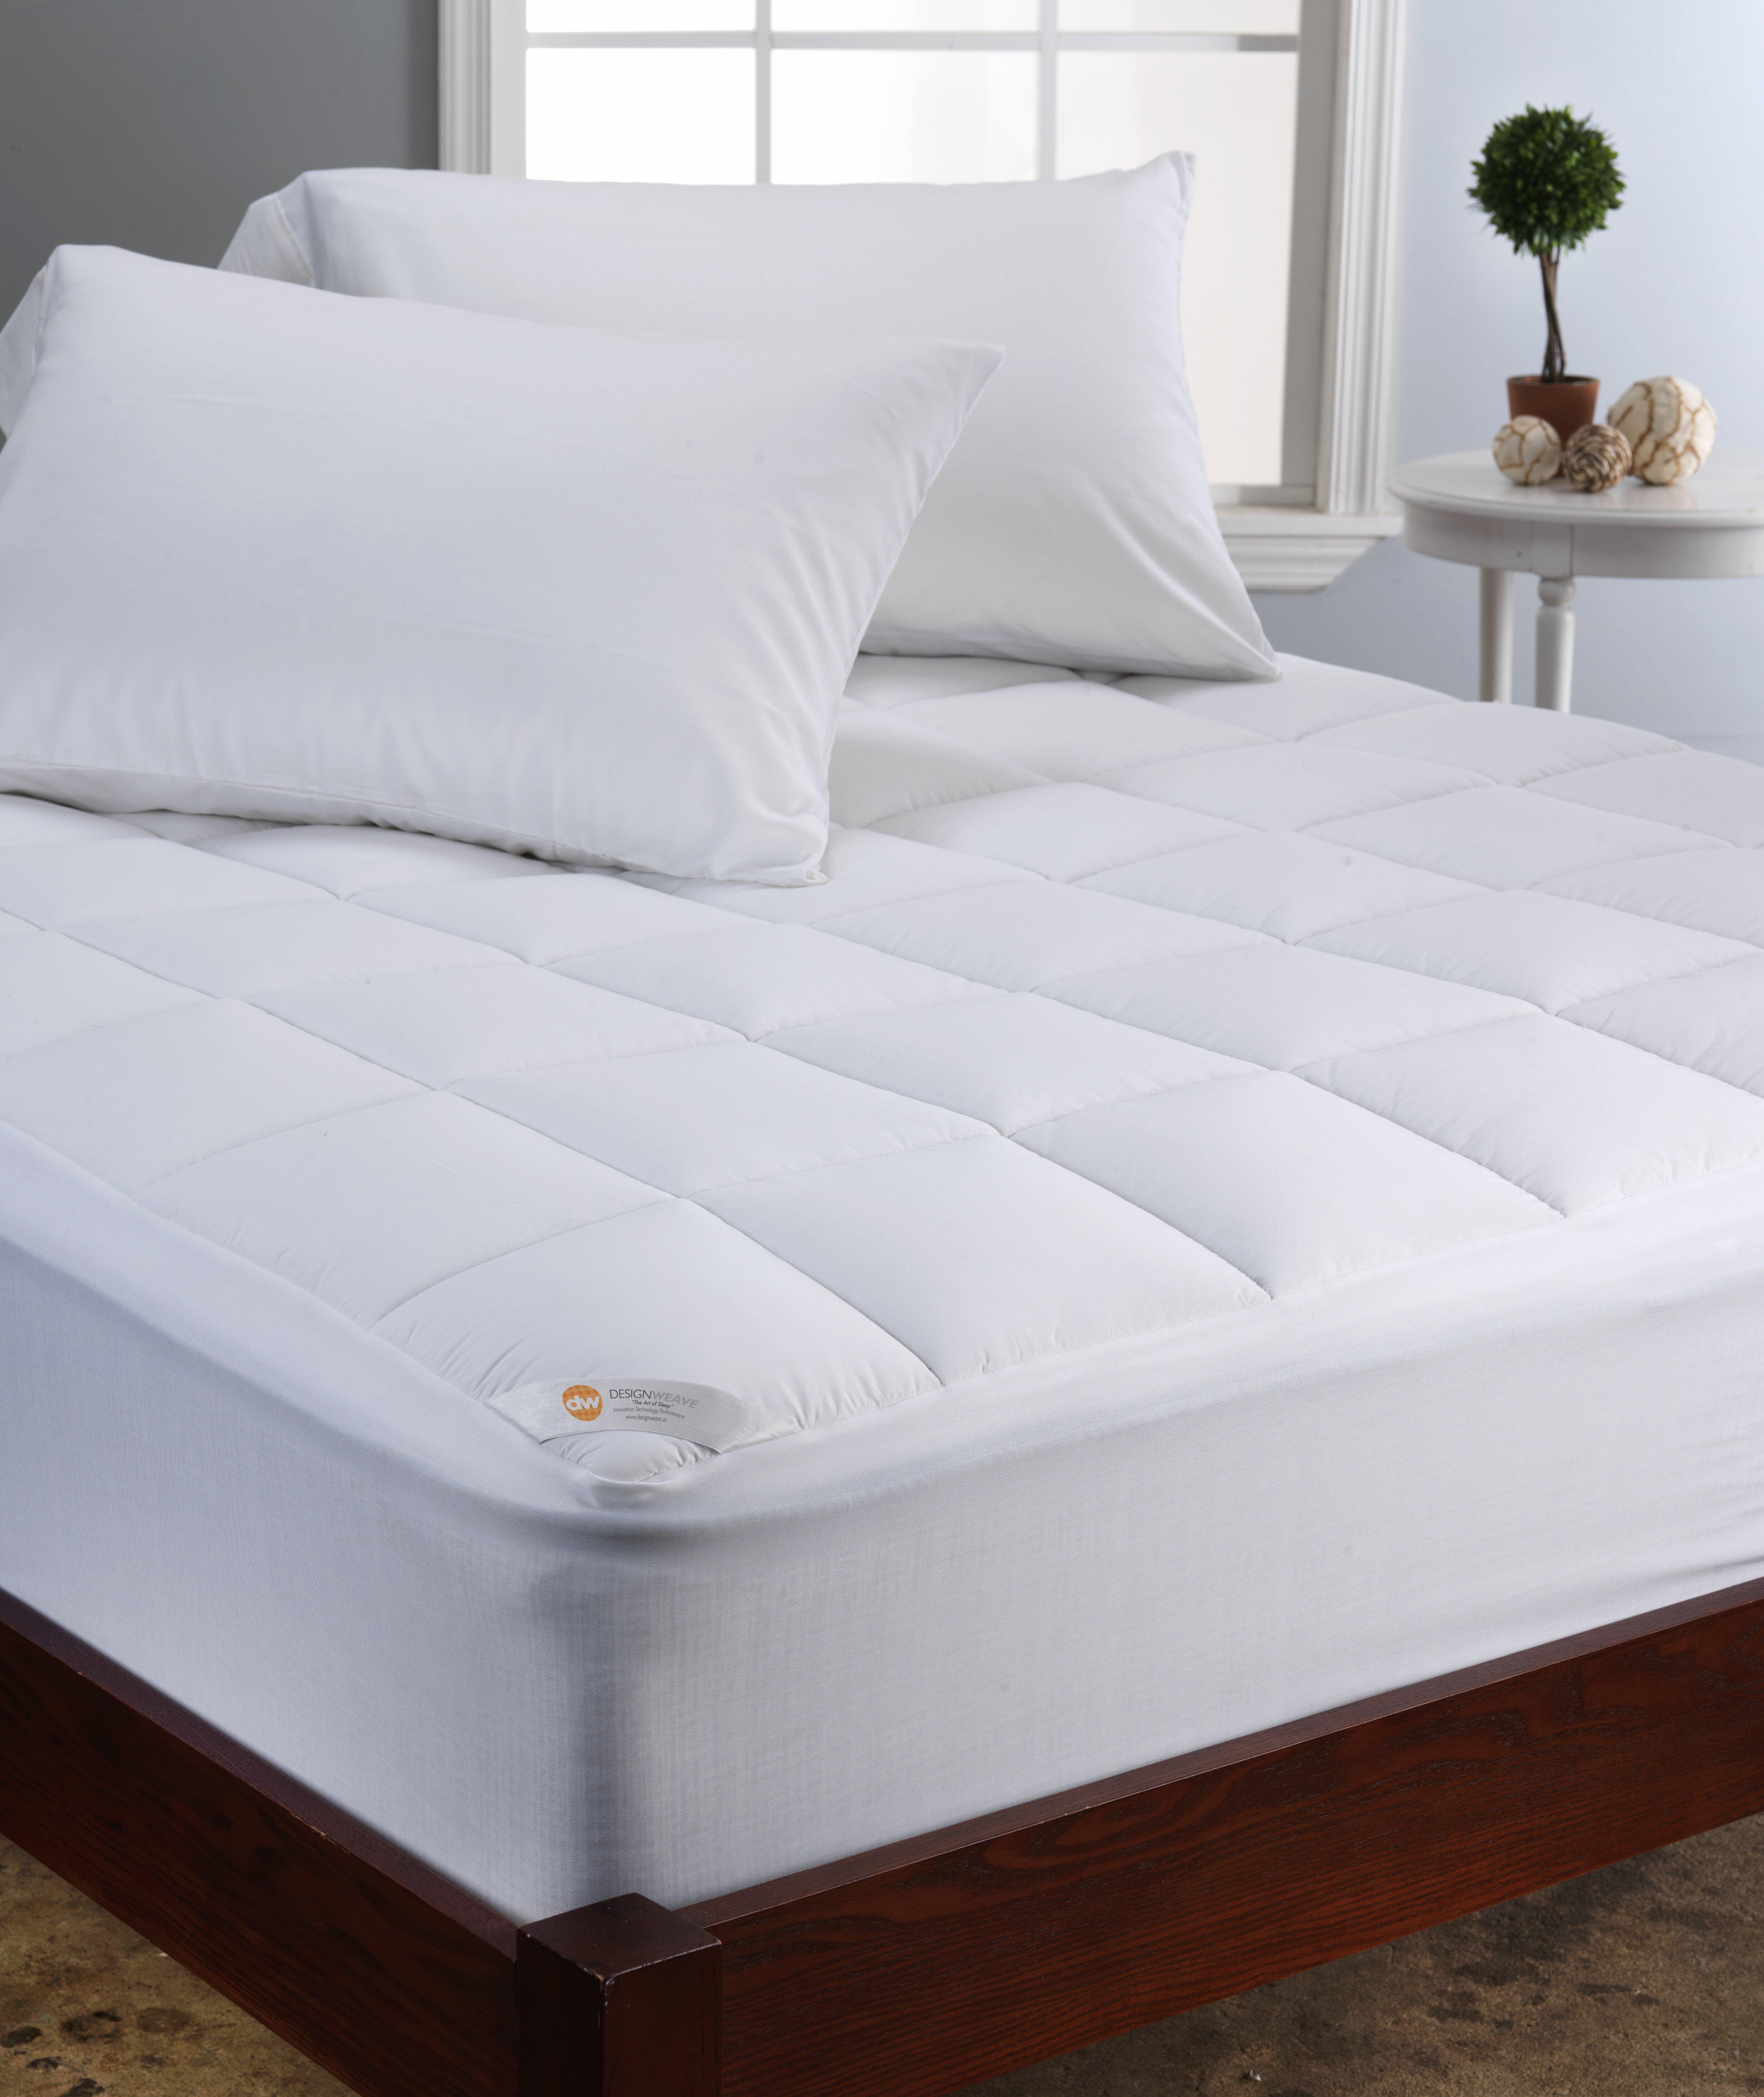 outlast temperature regulating hypoallergenic waterproof mattress